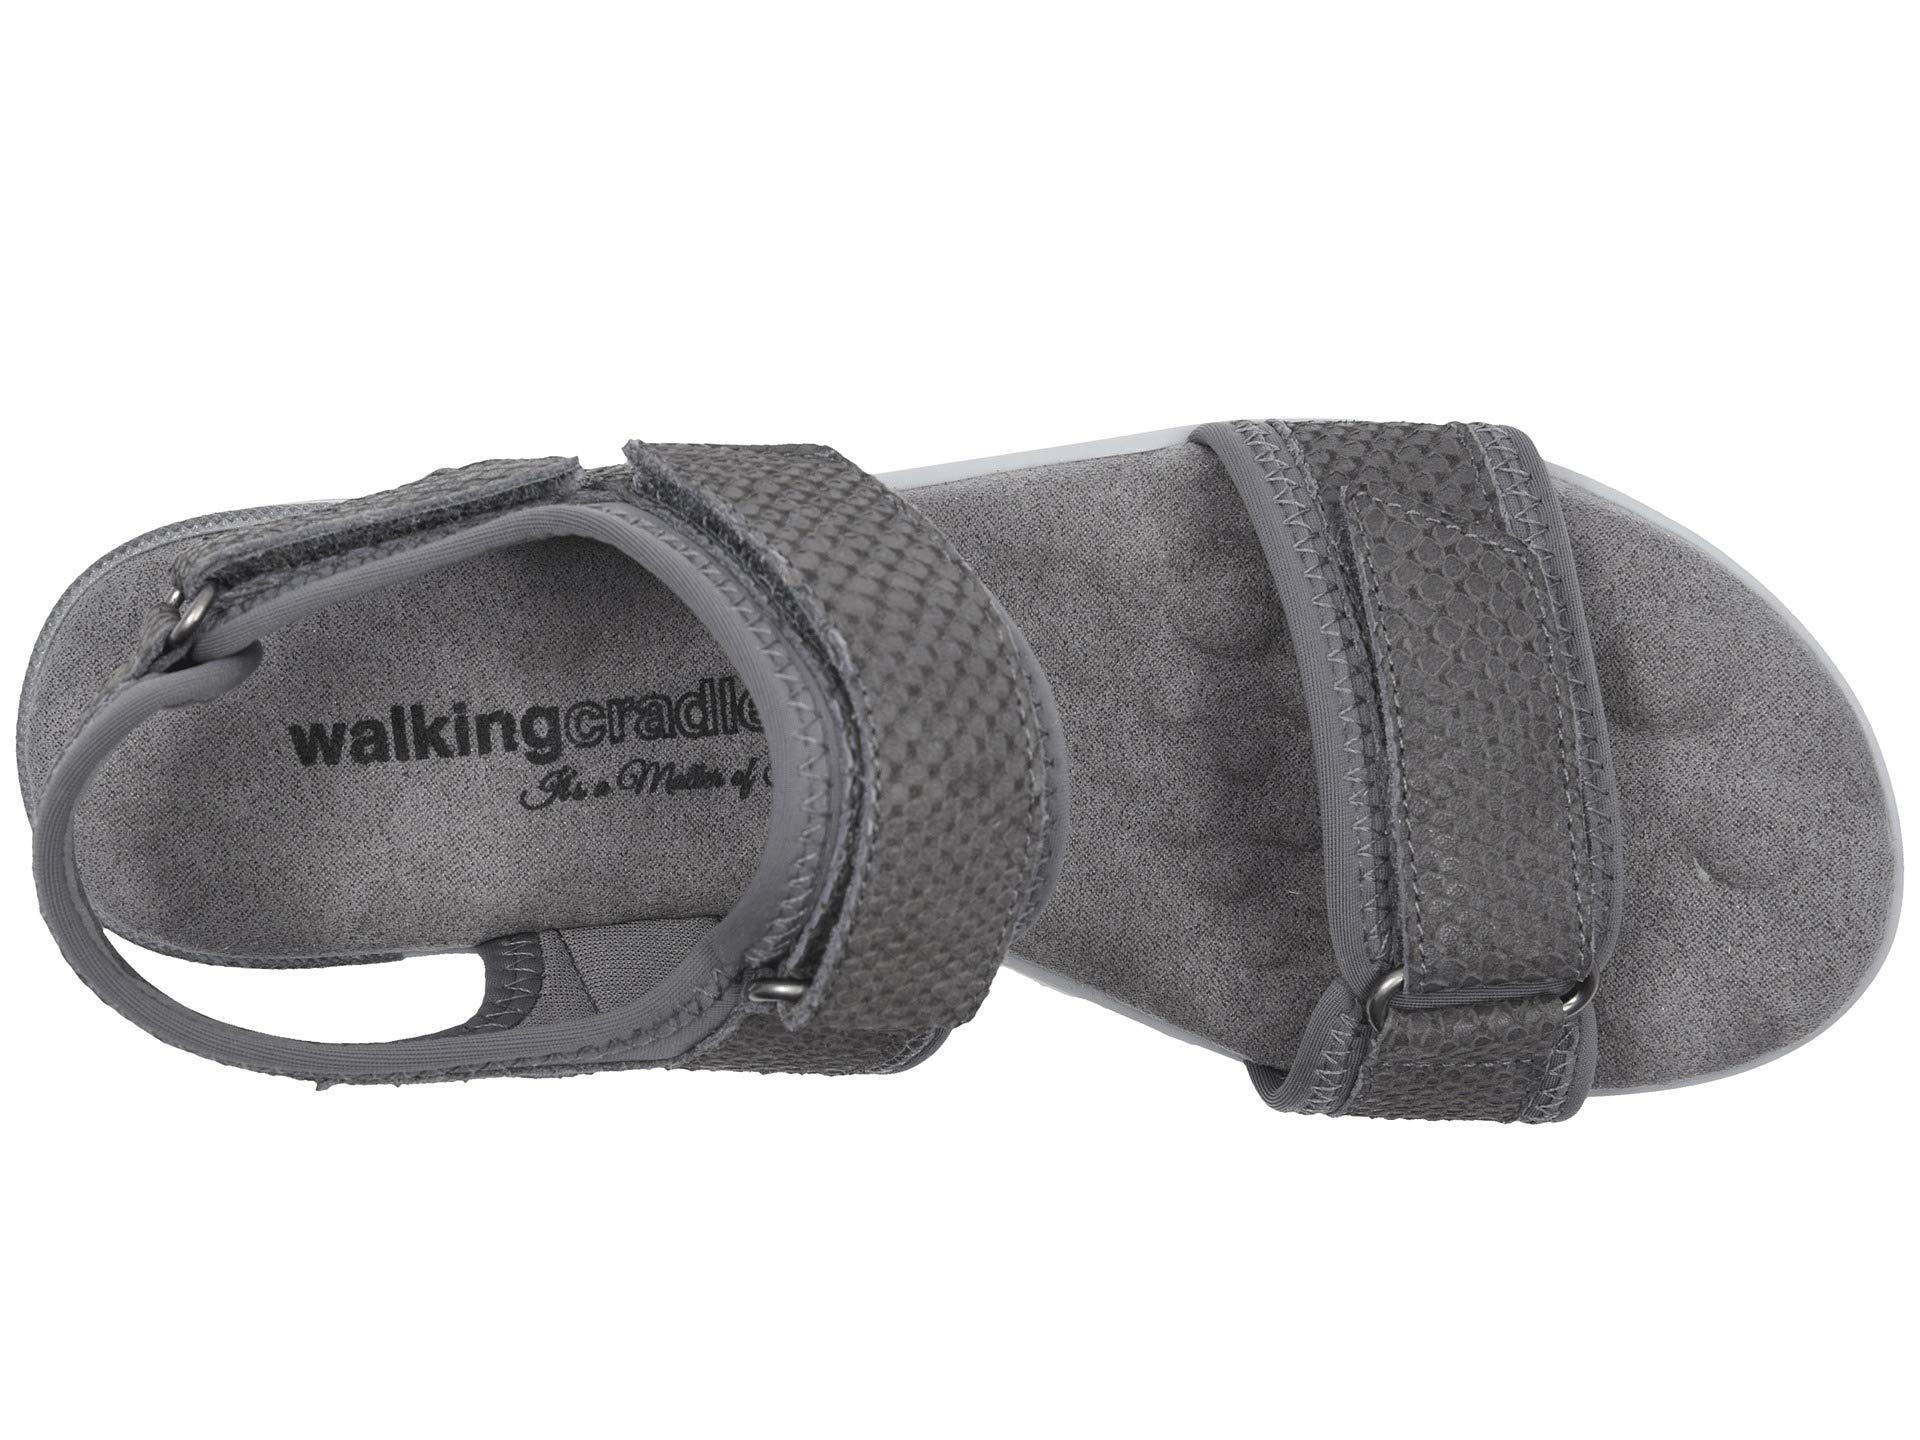 591e1e3ead8f Walking Cradles - Shea (slate Gray Lycra matte Snake Print) Women s Sandals  -. View fullscreen